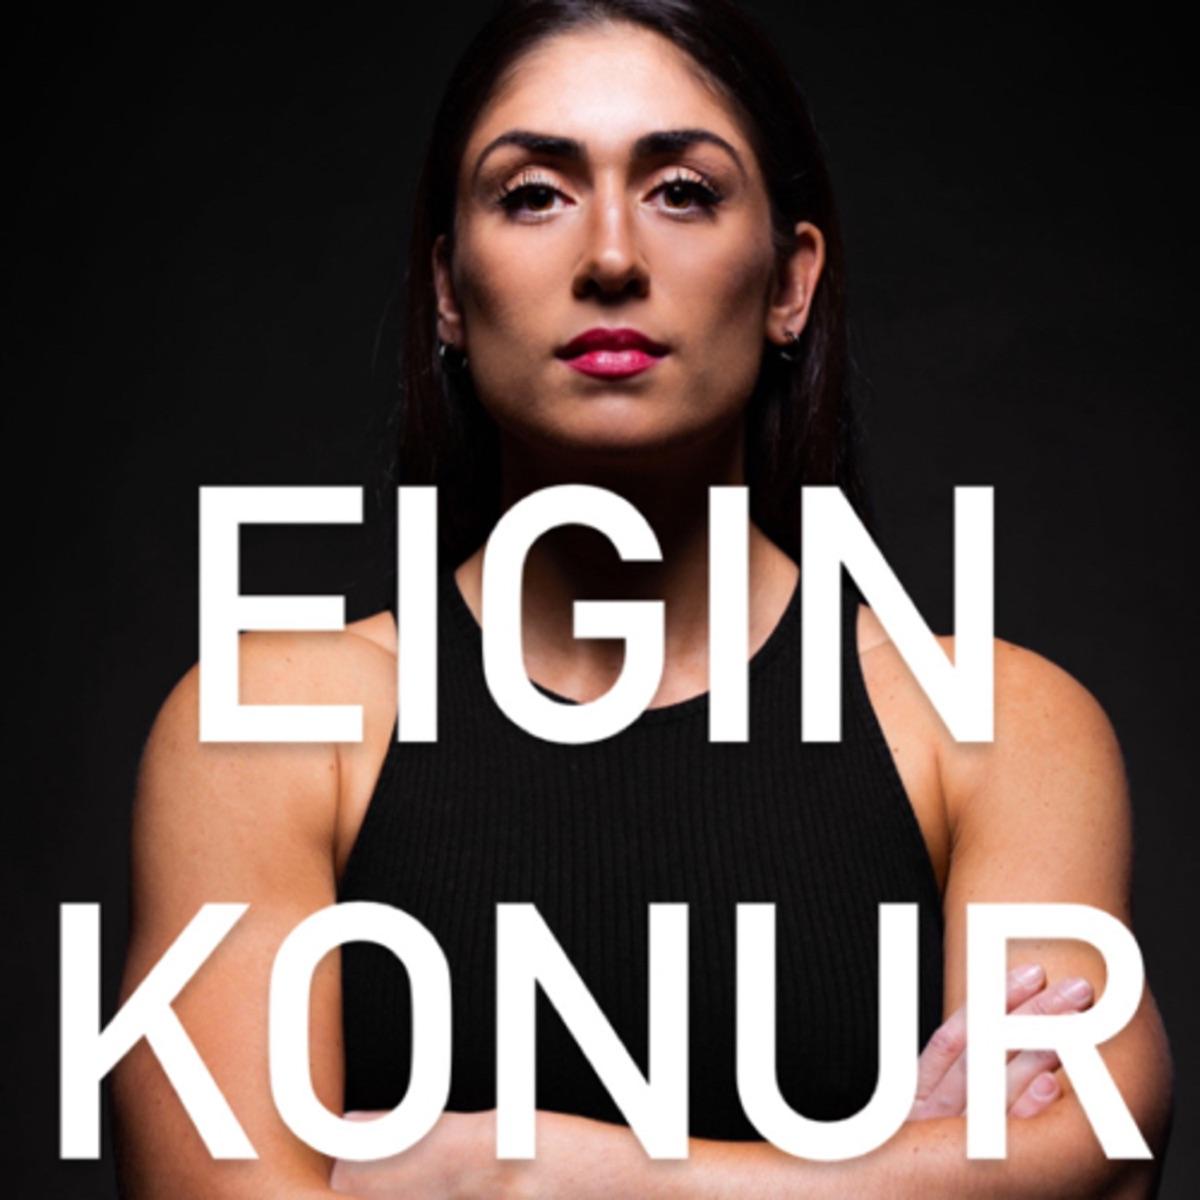 Eigin Konur